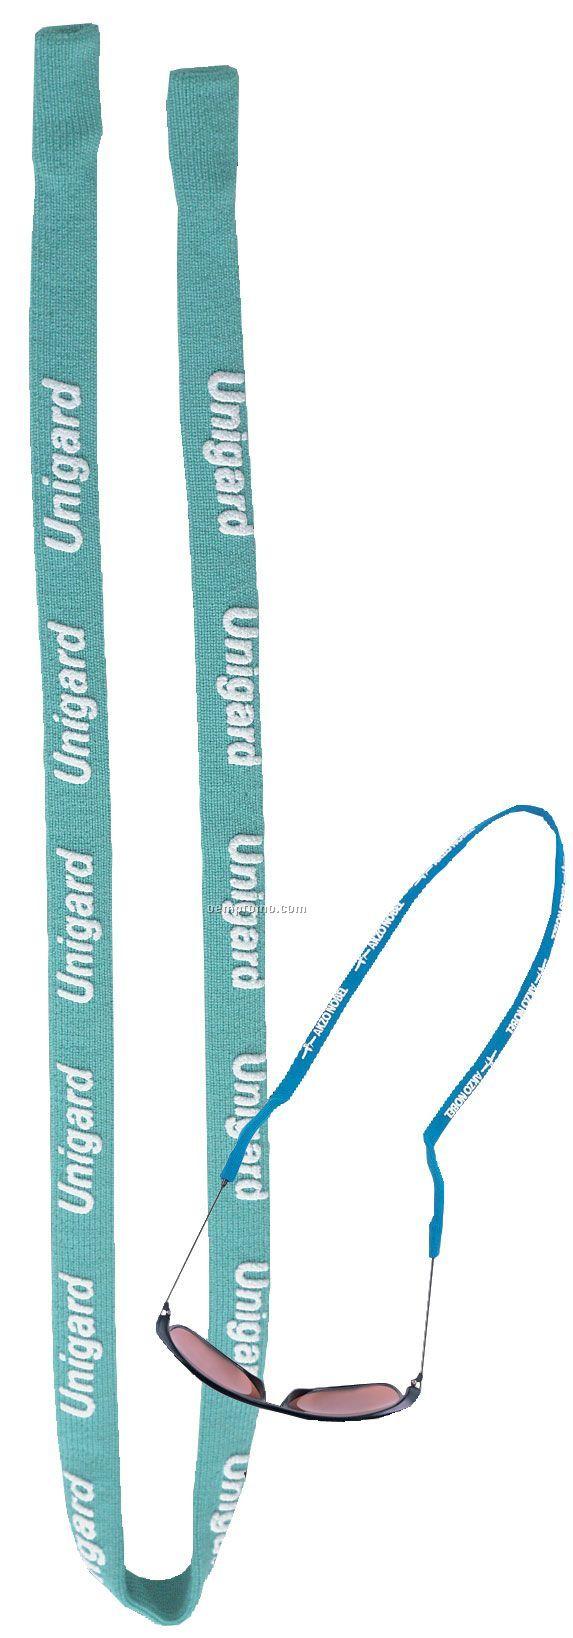 Nylon Elastic Tuck End Strap Eyewear Retainer